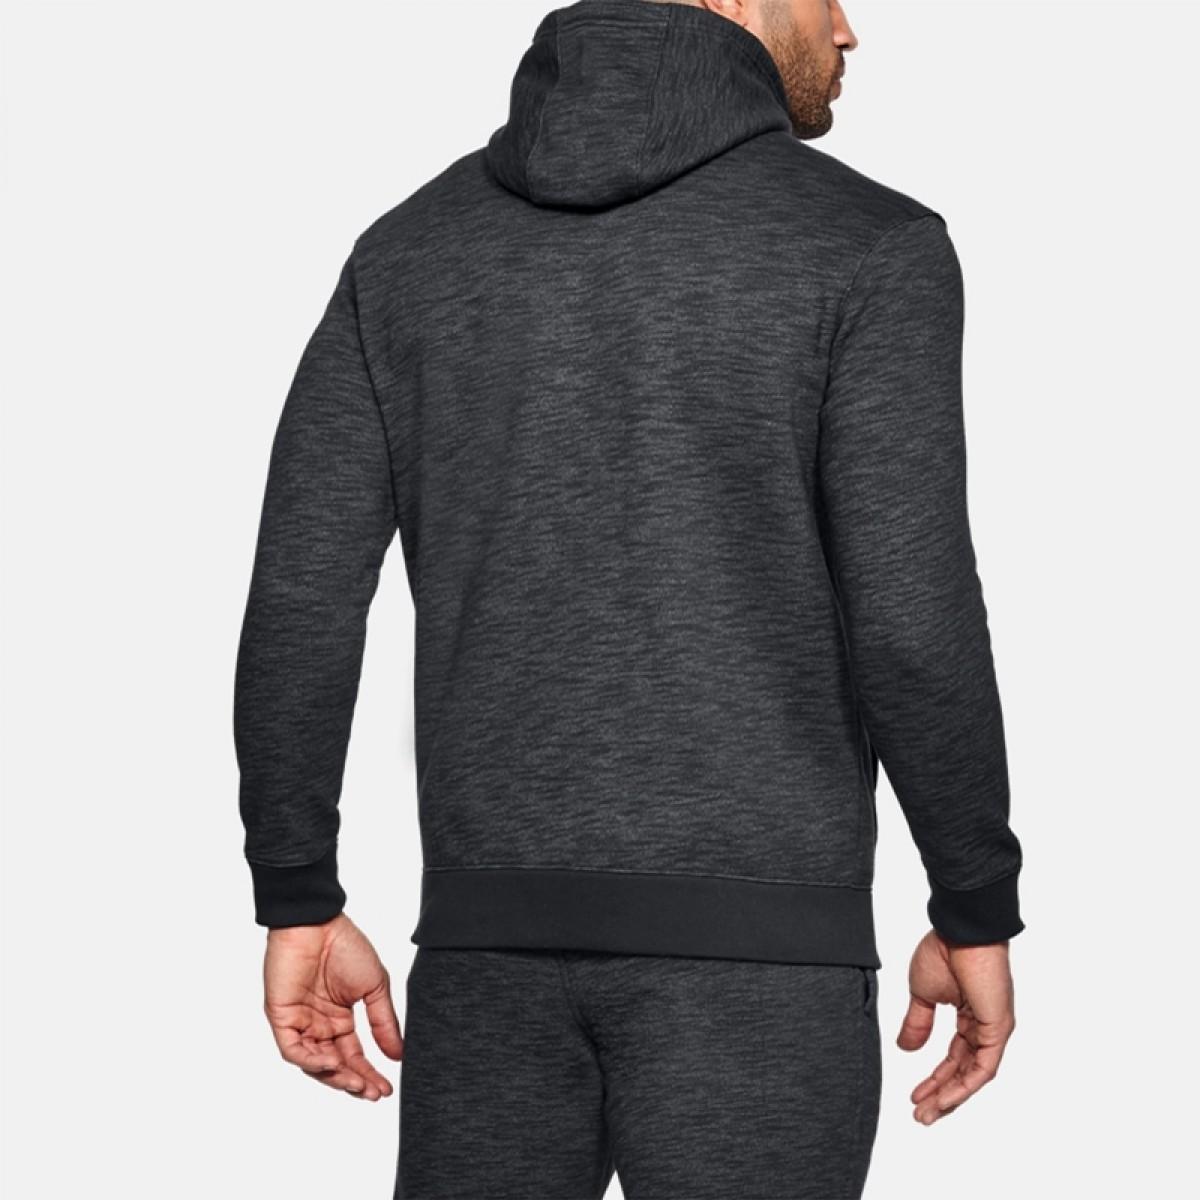 UA Baseline Hoody 'Black' 1309843-001